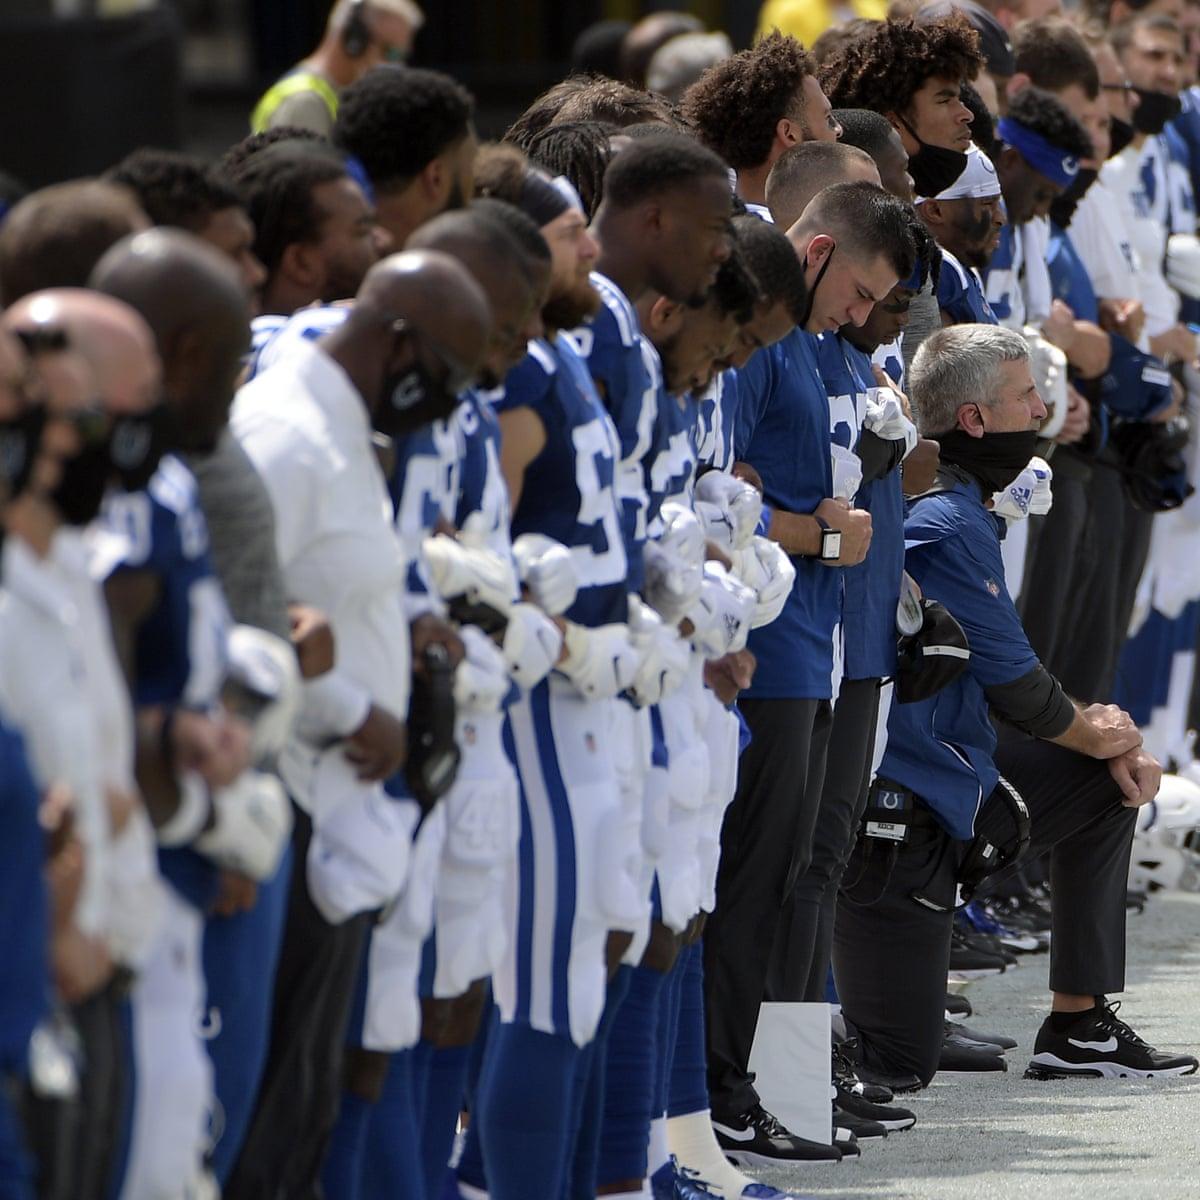 Colin Kaepernick Attacks Nfl Propaganda As Teams Protest On Opening Weekend Colin Kaepernick The Guardian